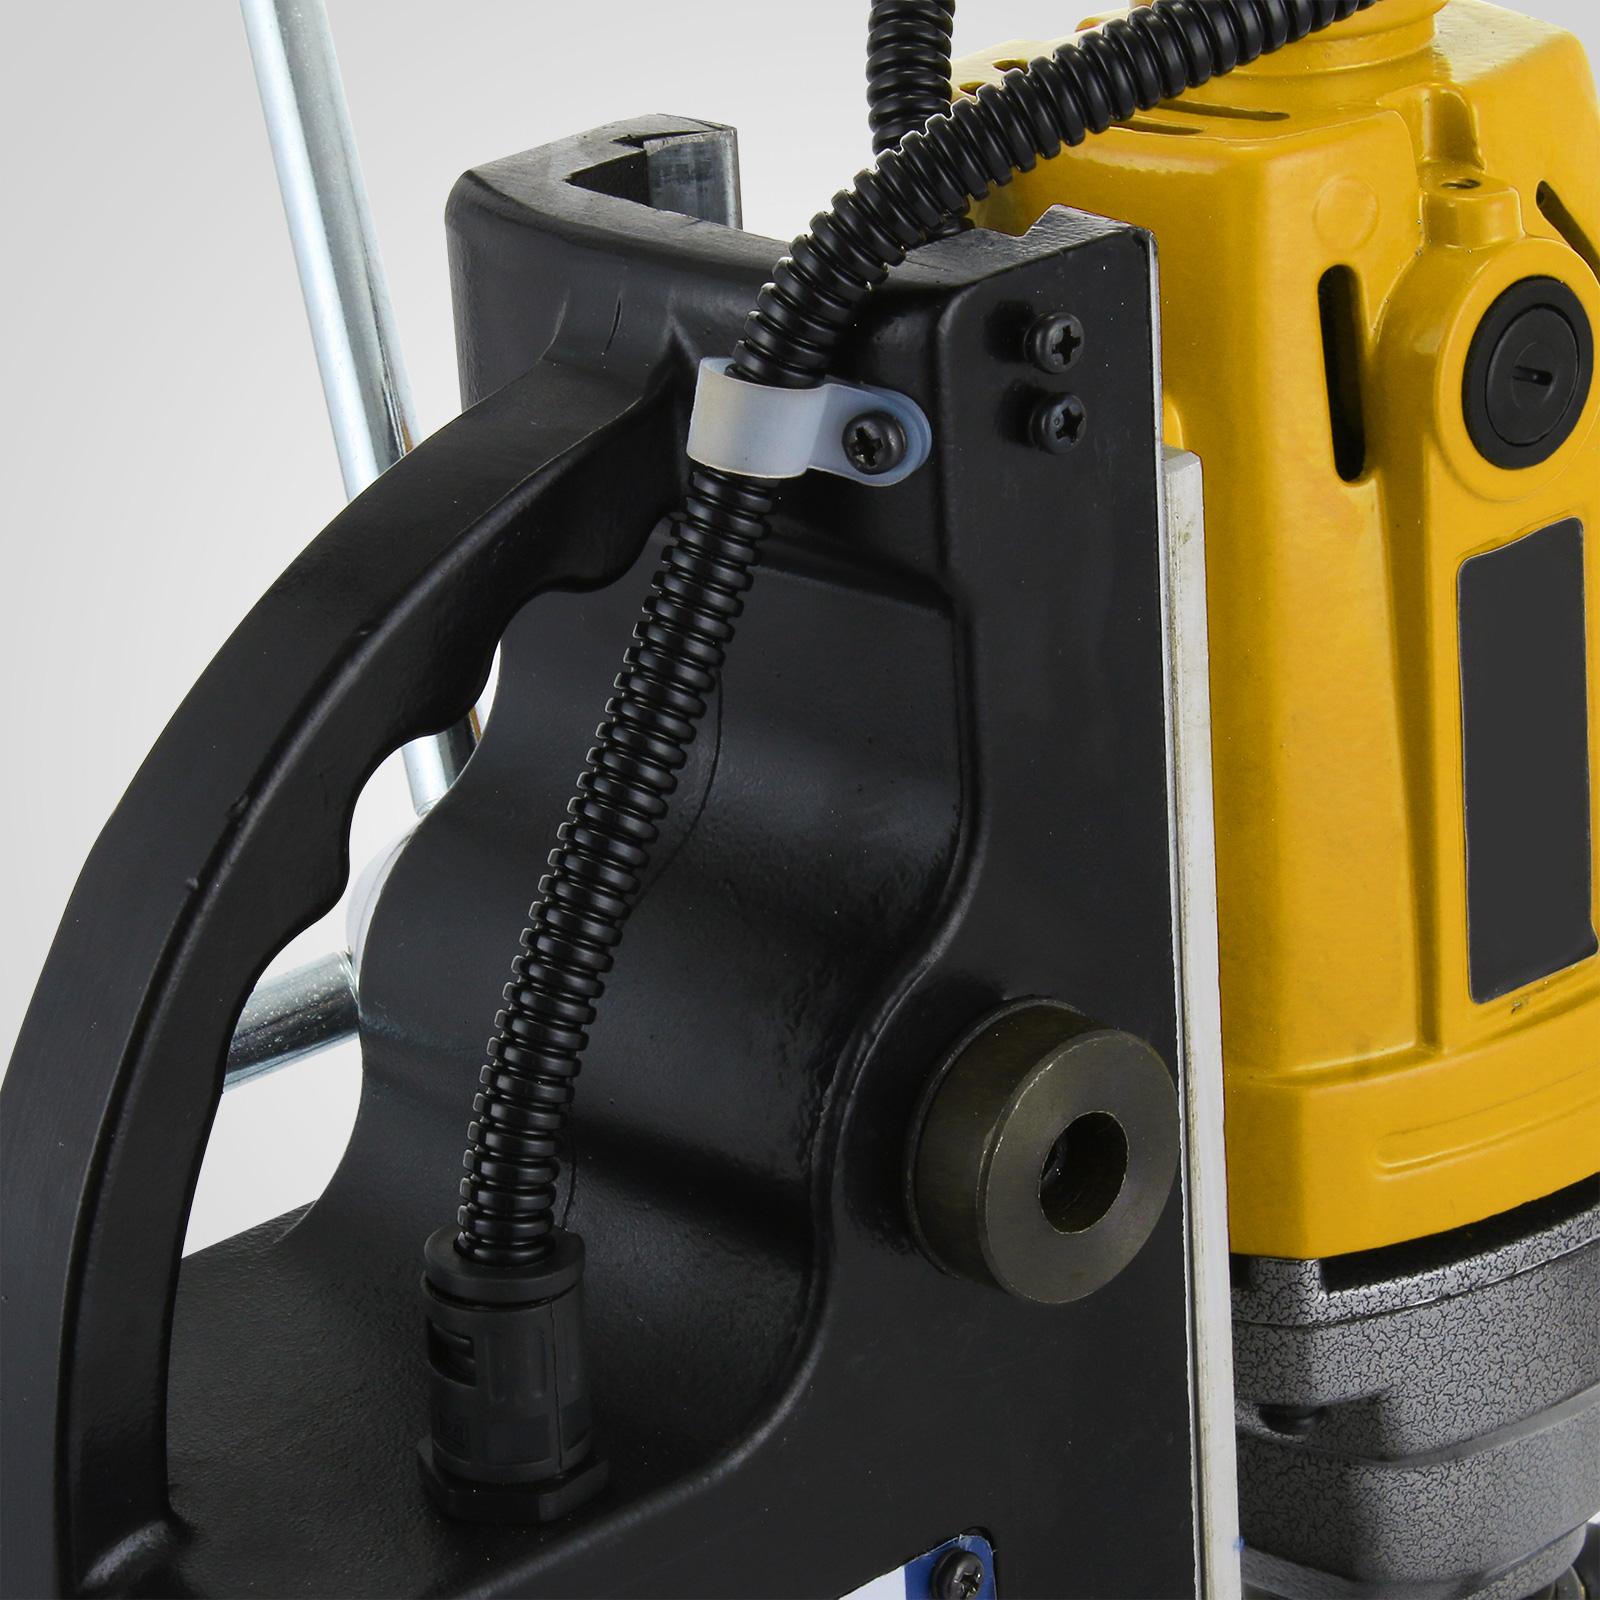 MB23-BRM35-MD40-Trapano-Perforatrice-Carotatore-Fresa-Magnetico-12-40mm-230V miniatura 35